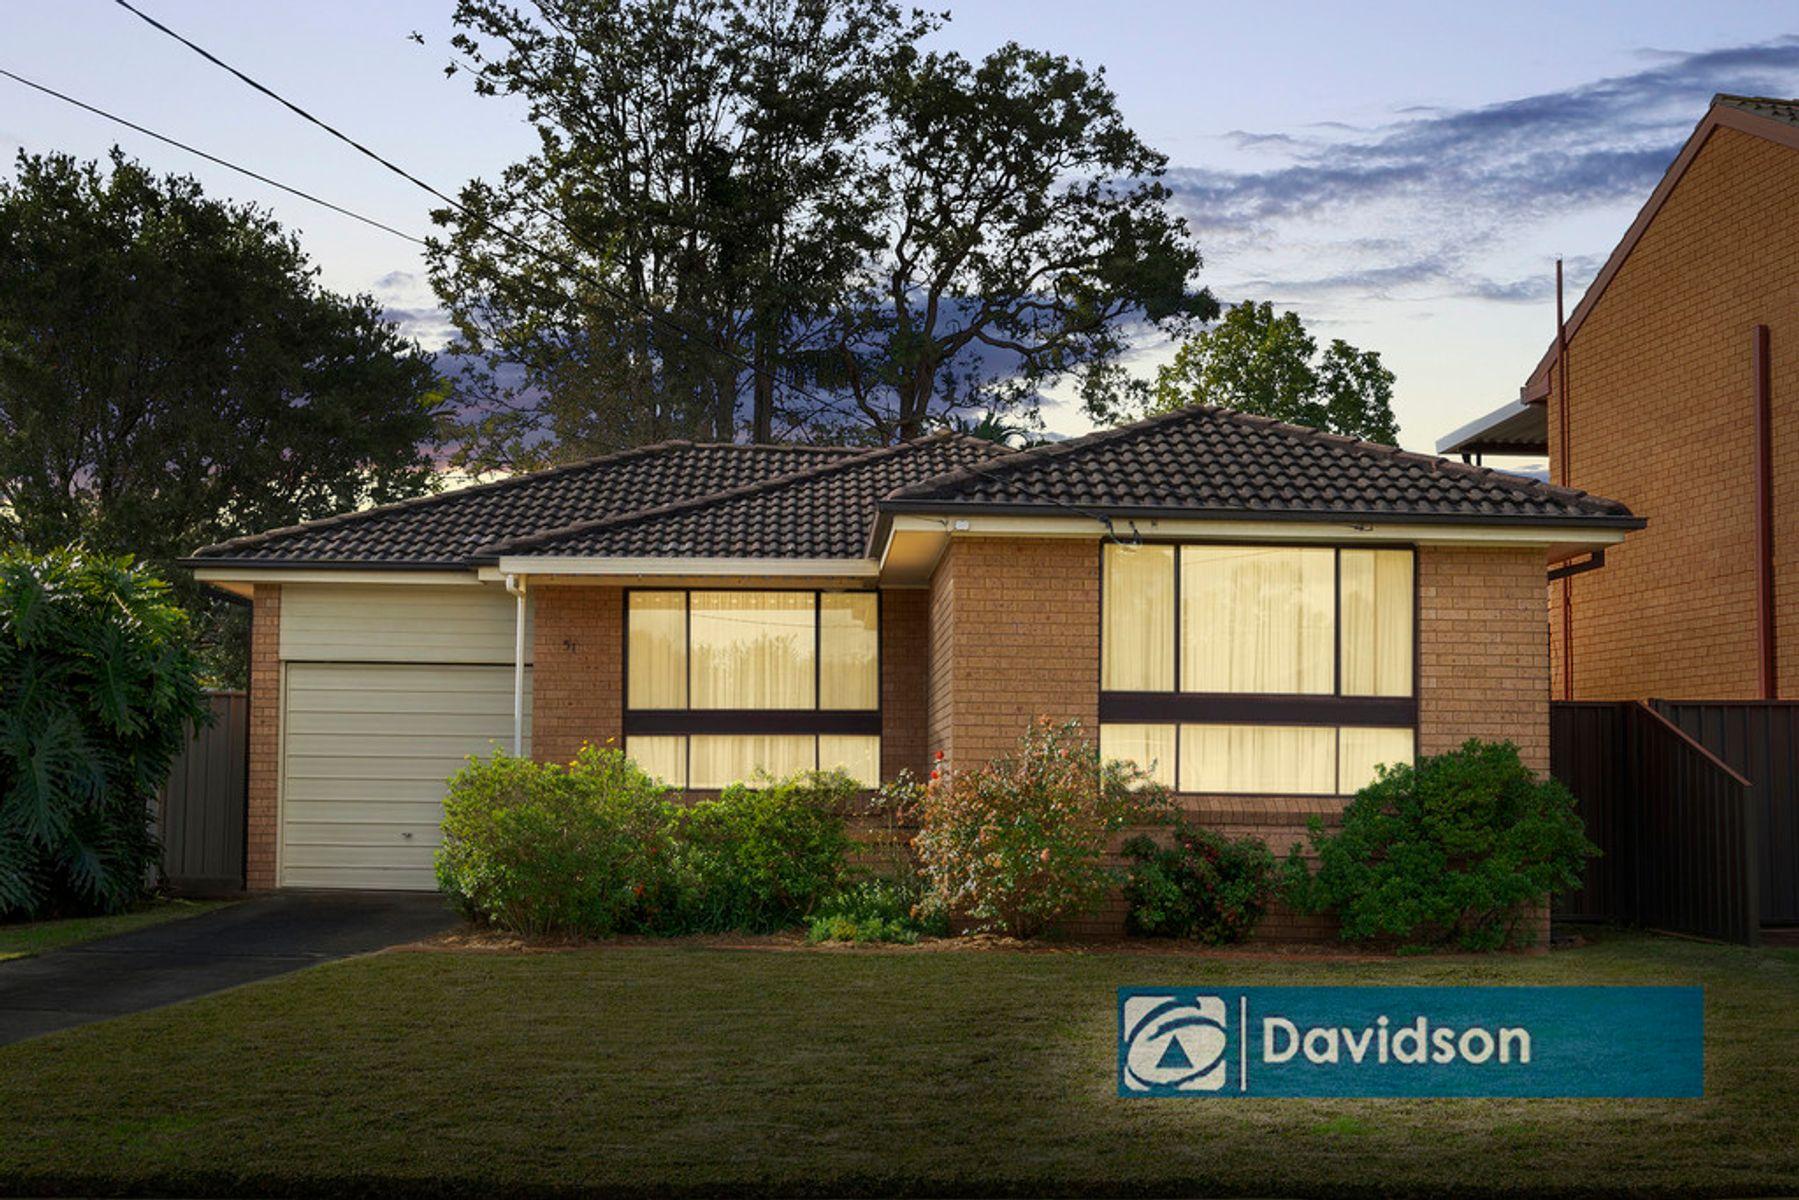 51 Bradey Ave, Hammondville, NSW 2170